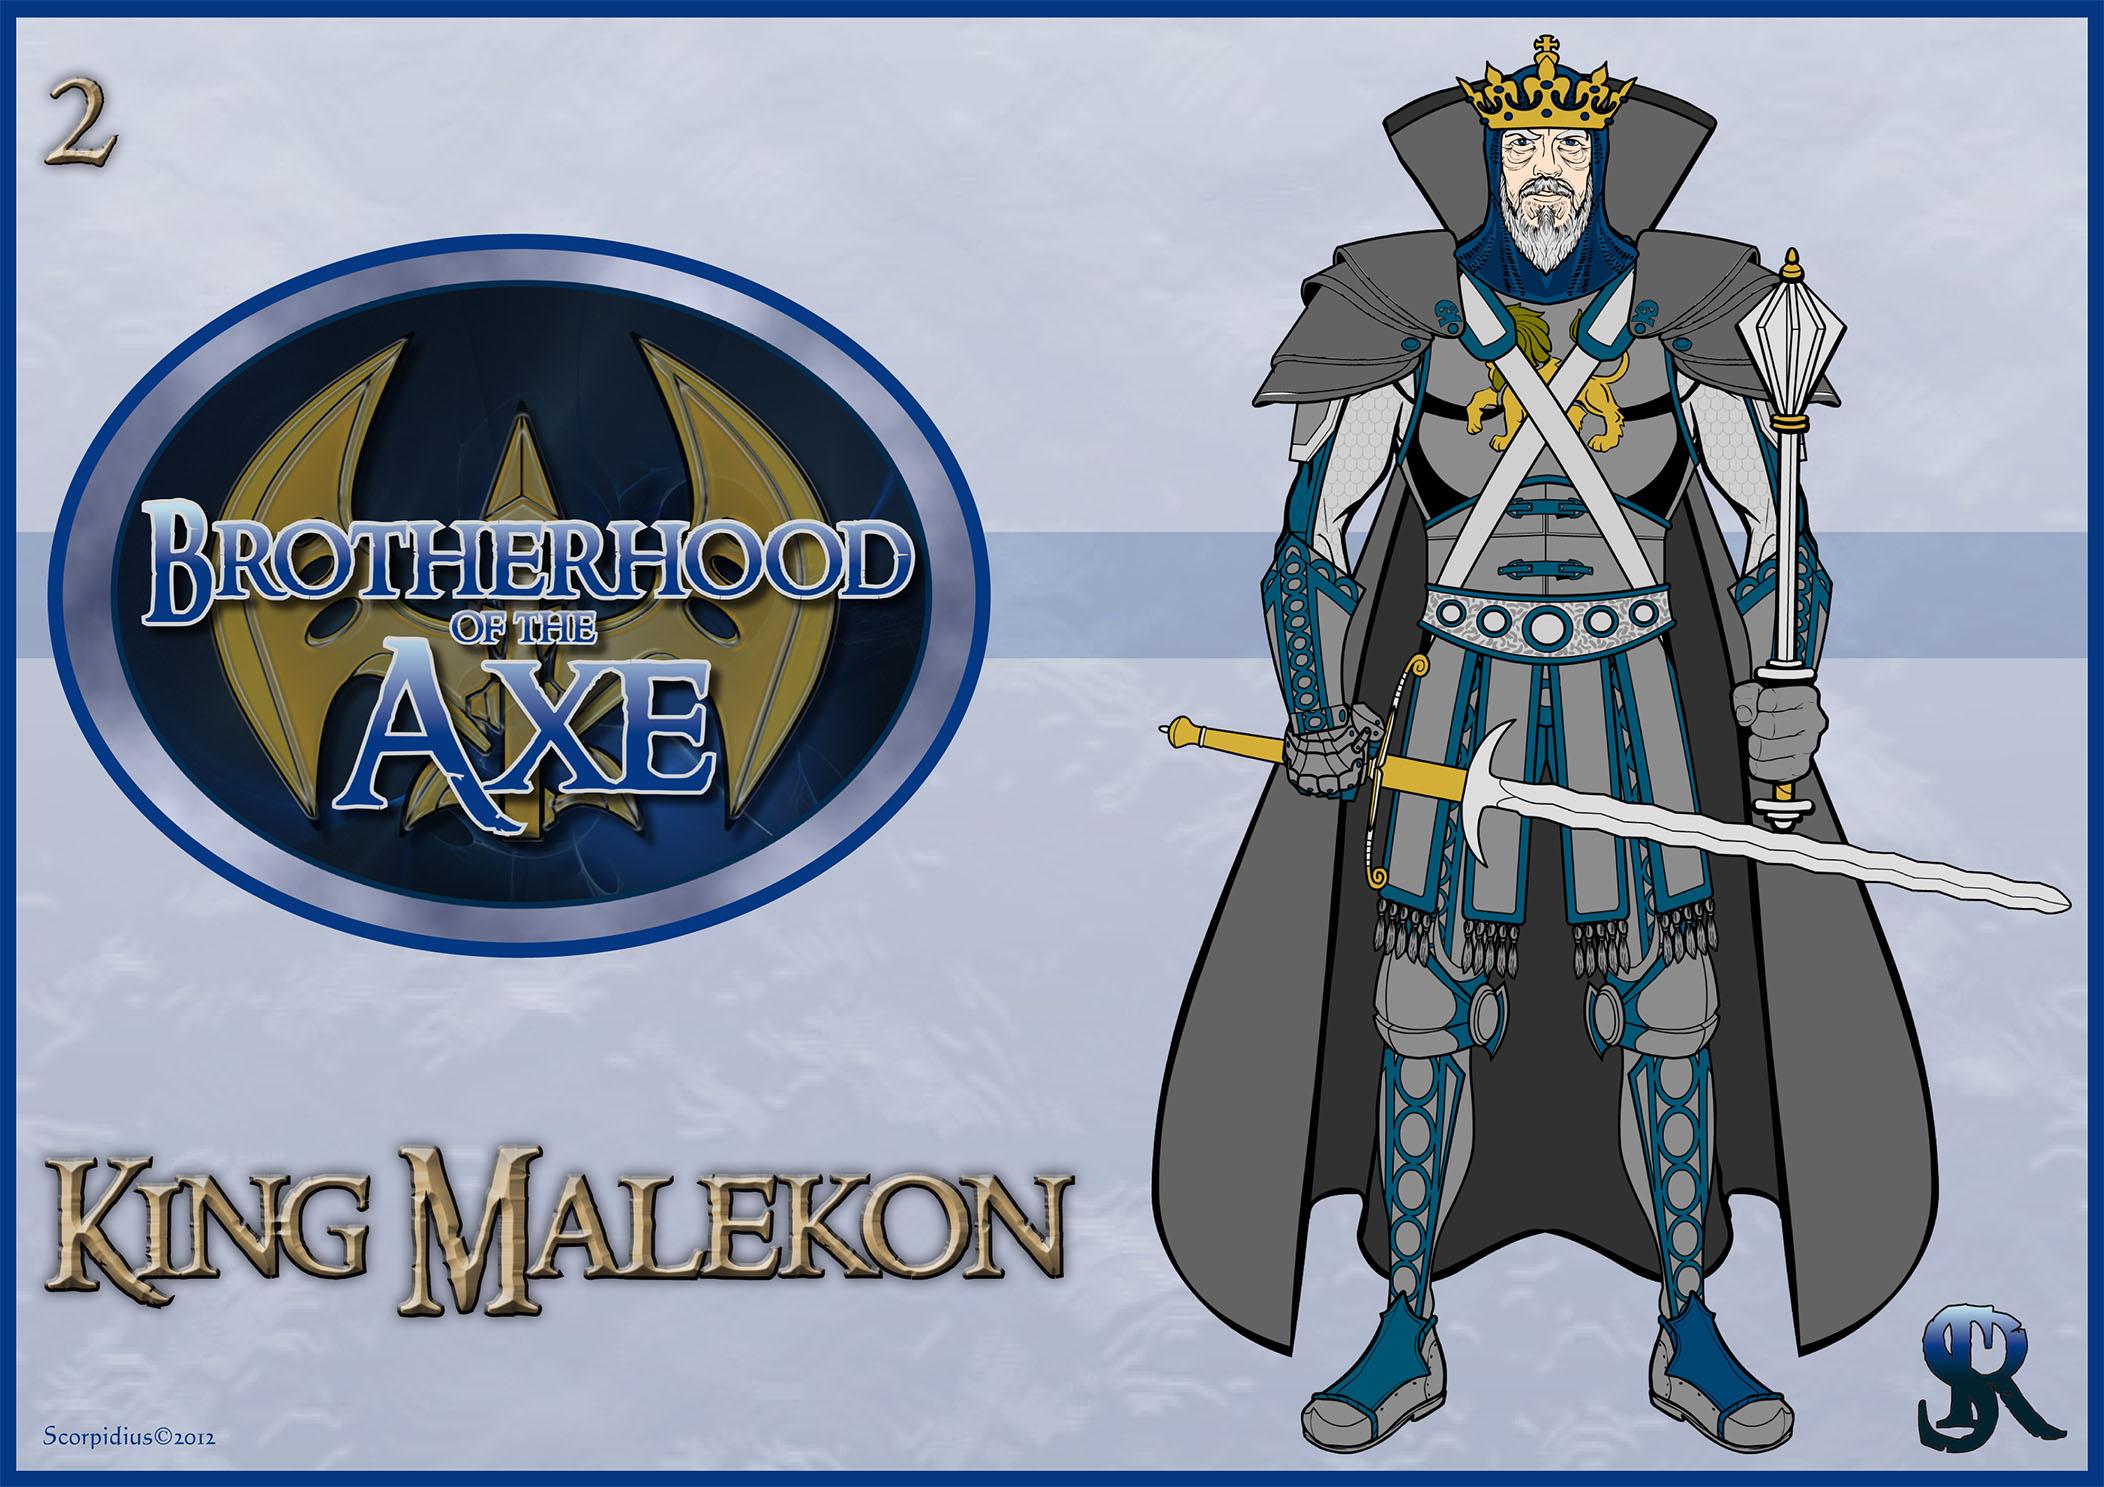 002-King-Malekon.jpg